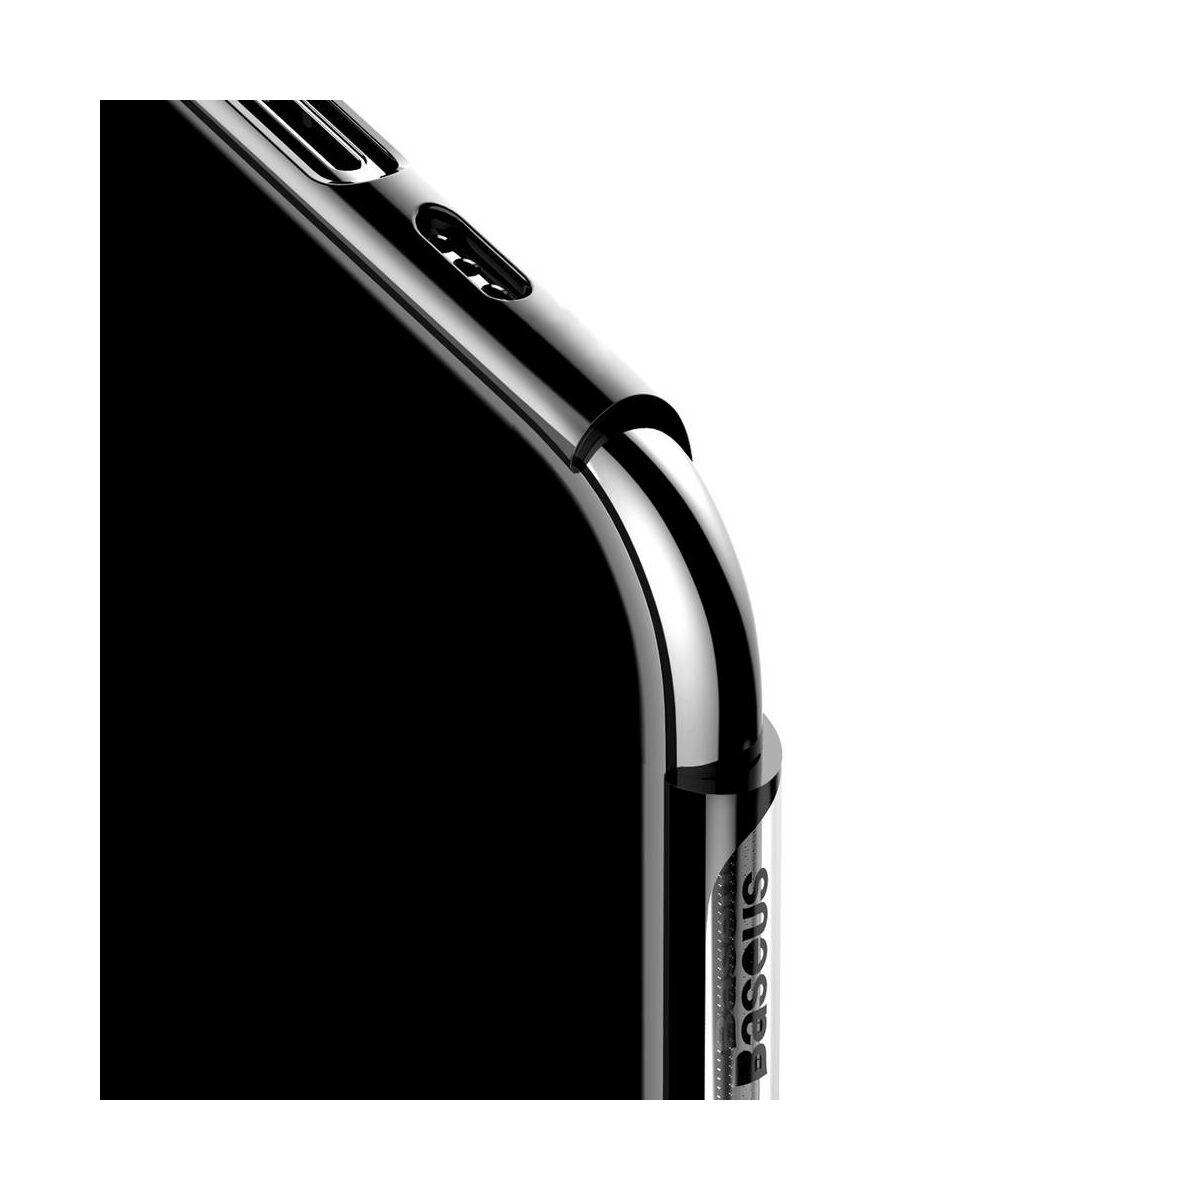 Baseus iPhone 11 Pro Max tok, Glitter, fekete (WIAPIPH65S-DW01)